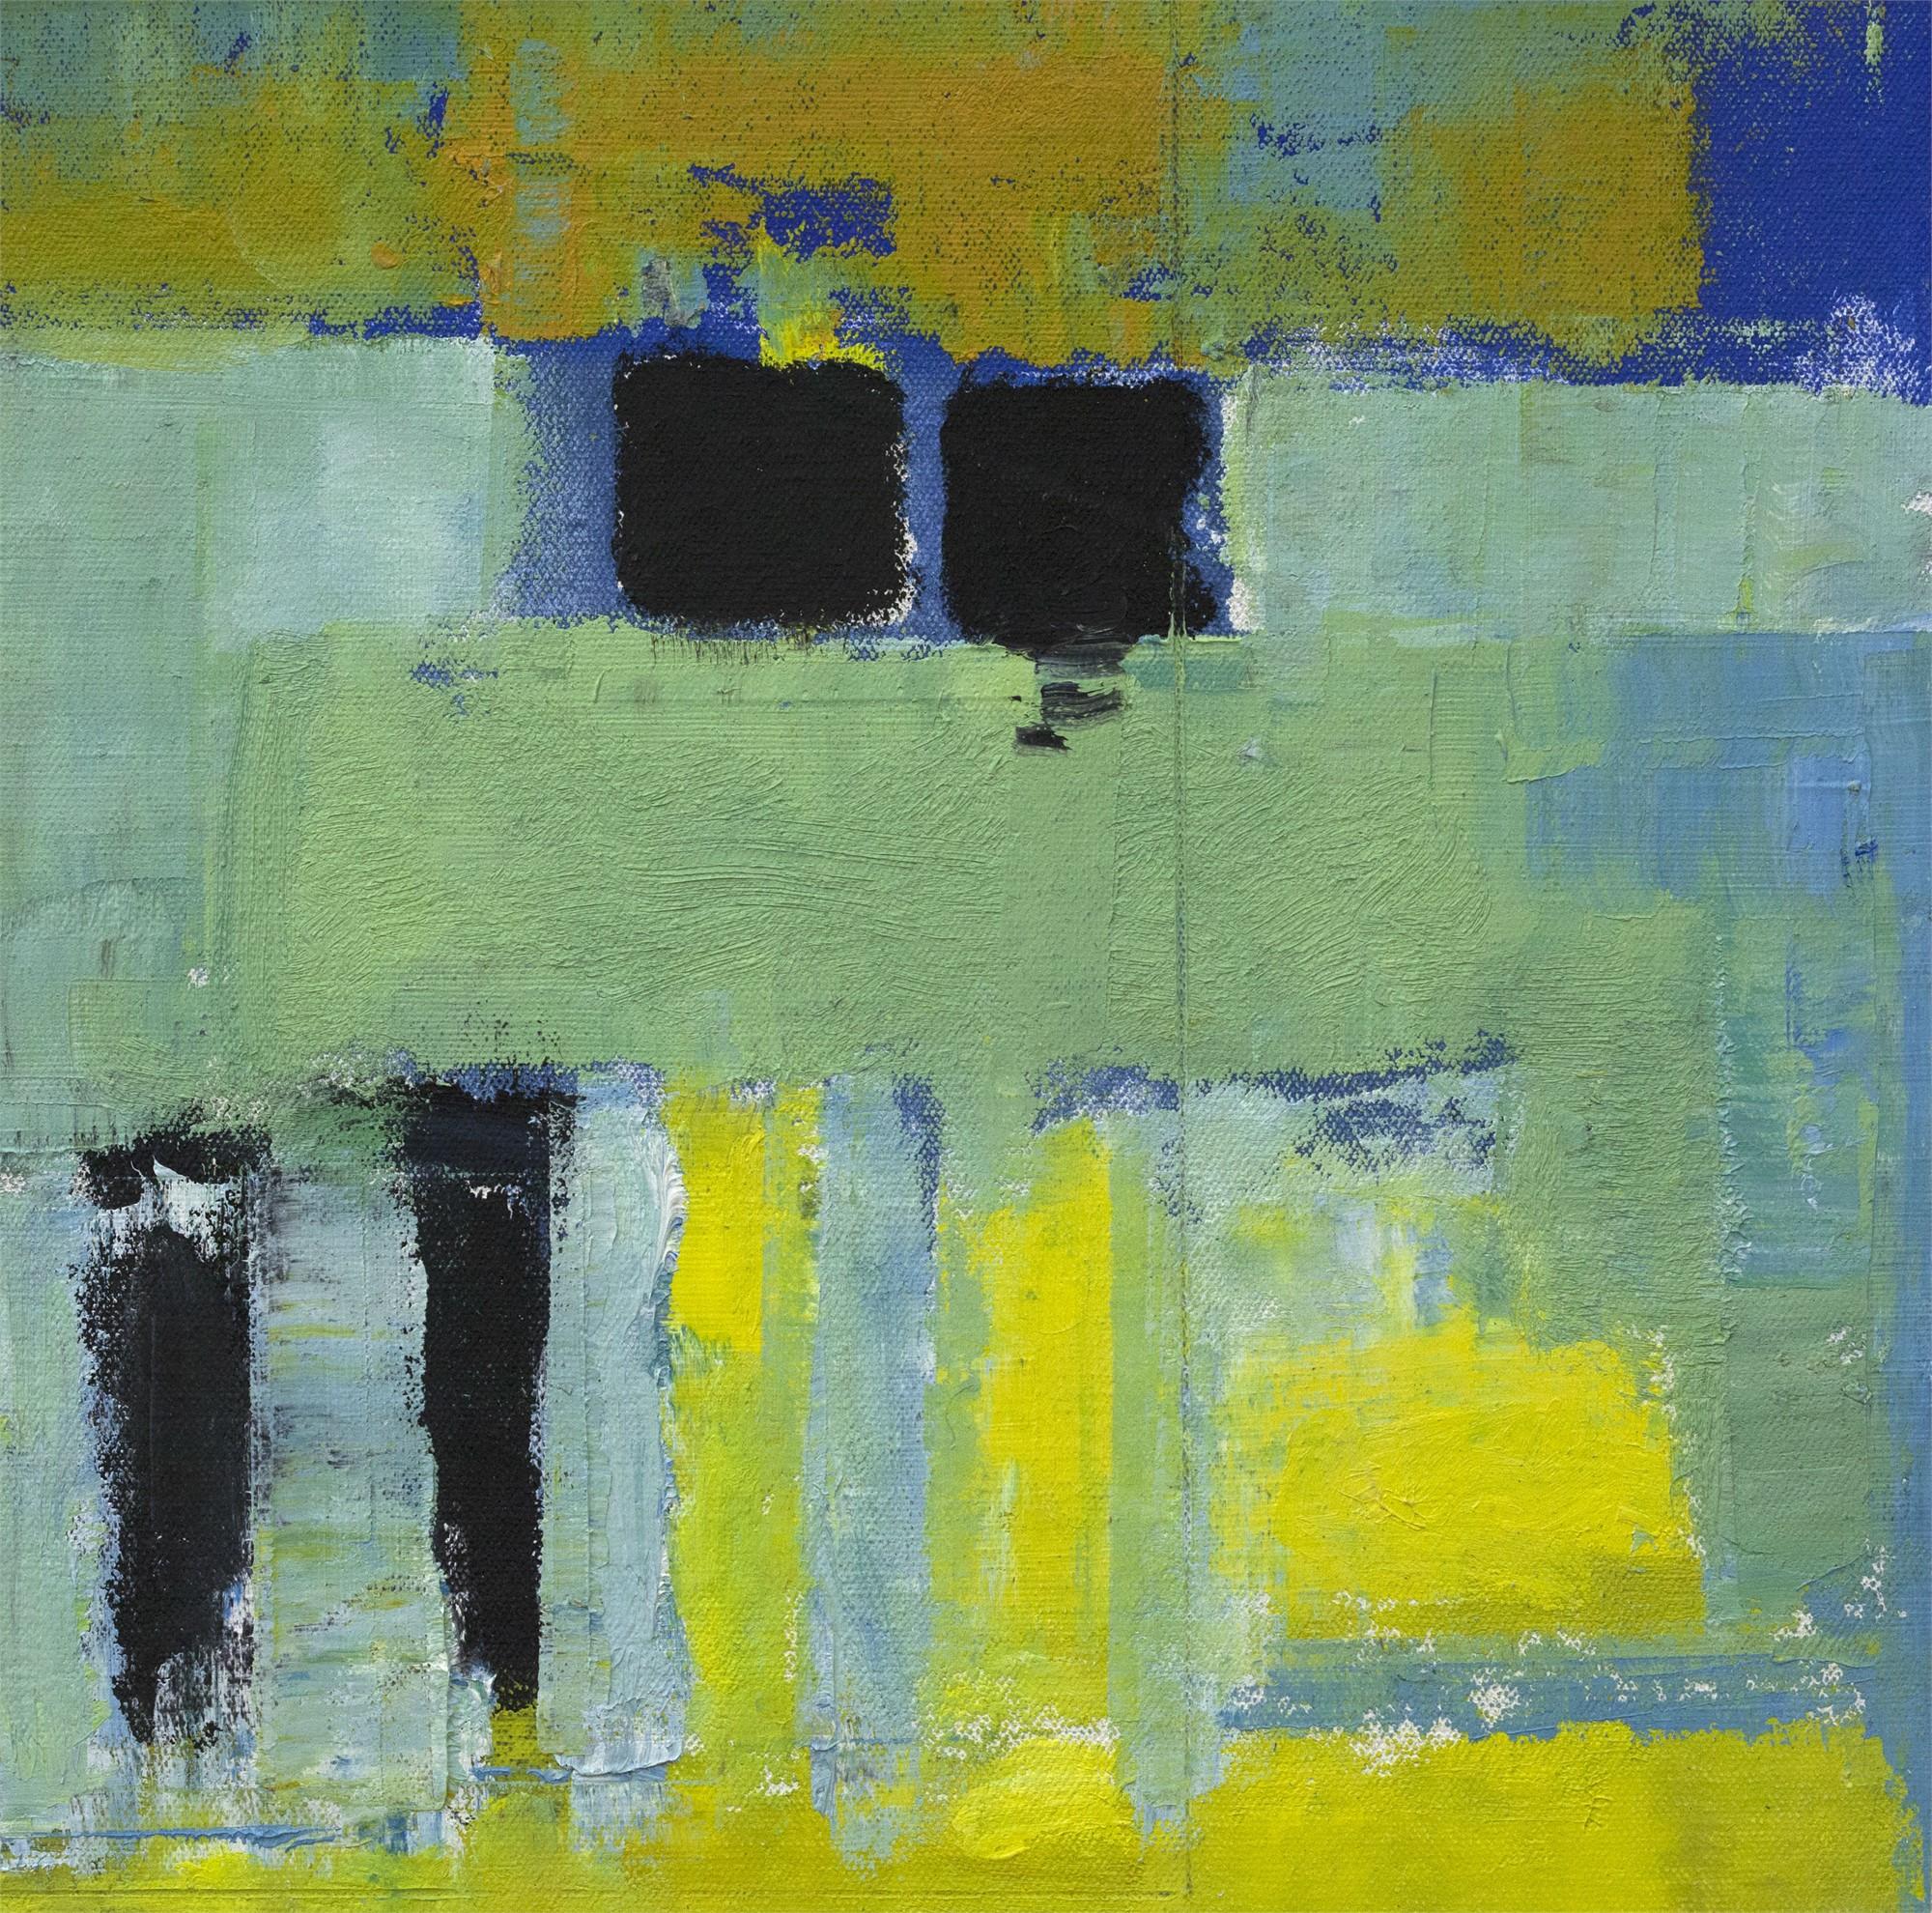 Passing Through by John McCaw